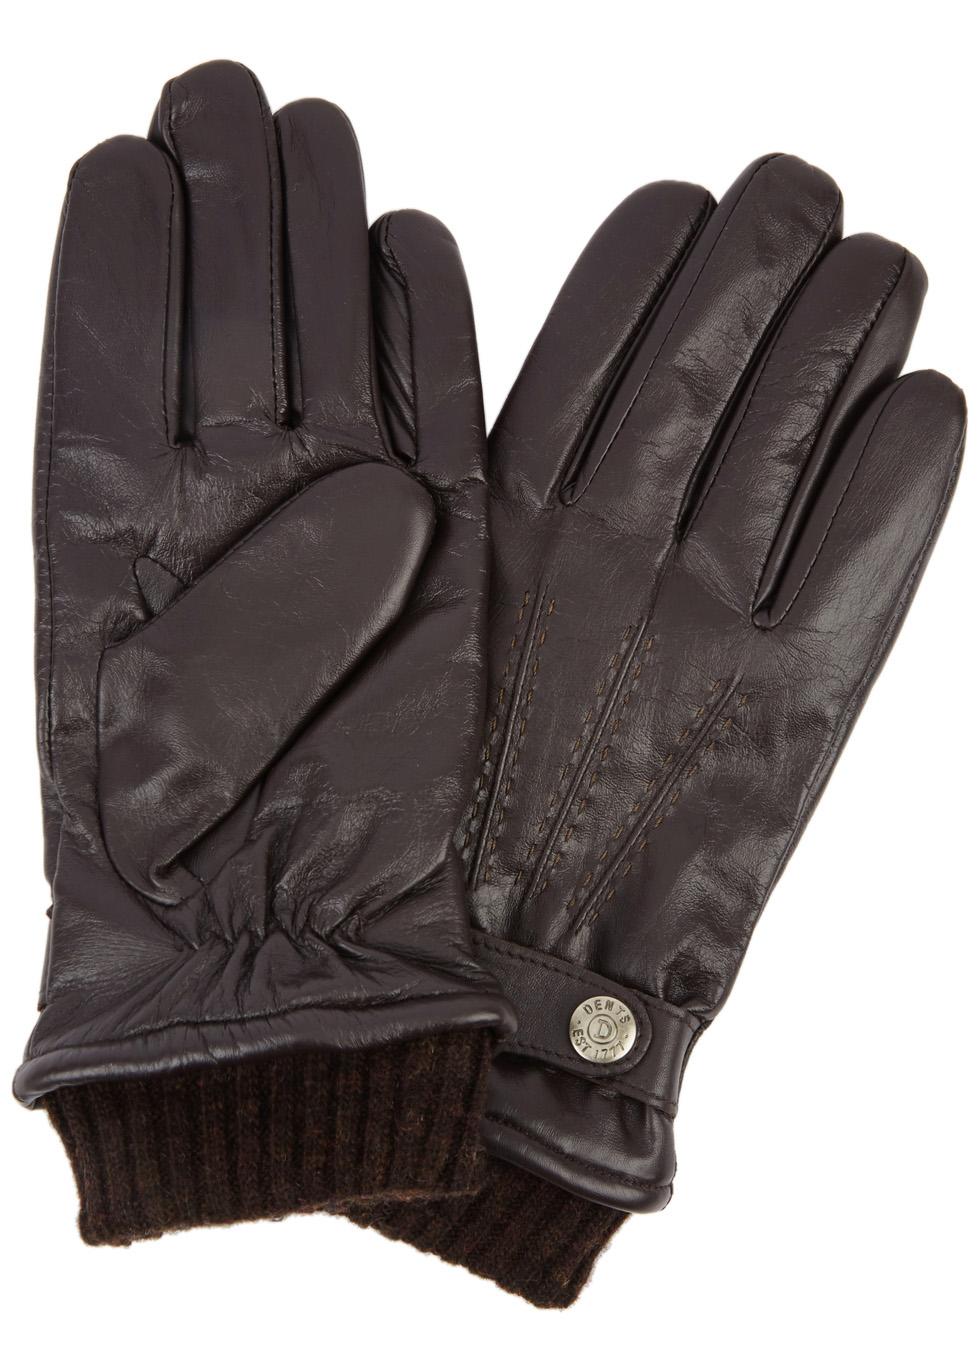 DENTS Henley Touchscreen Leather Gloves - Dark Brown